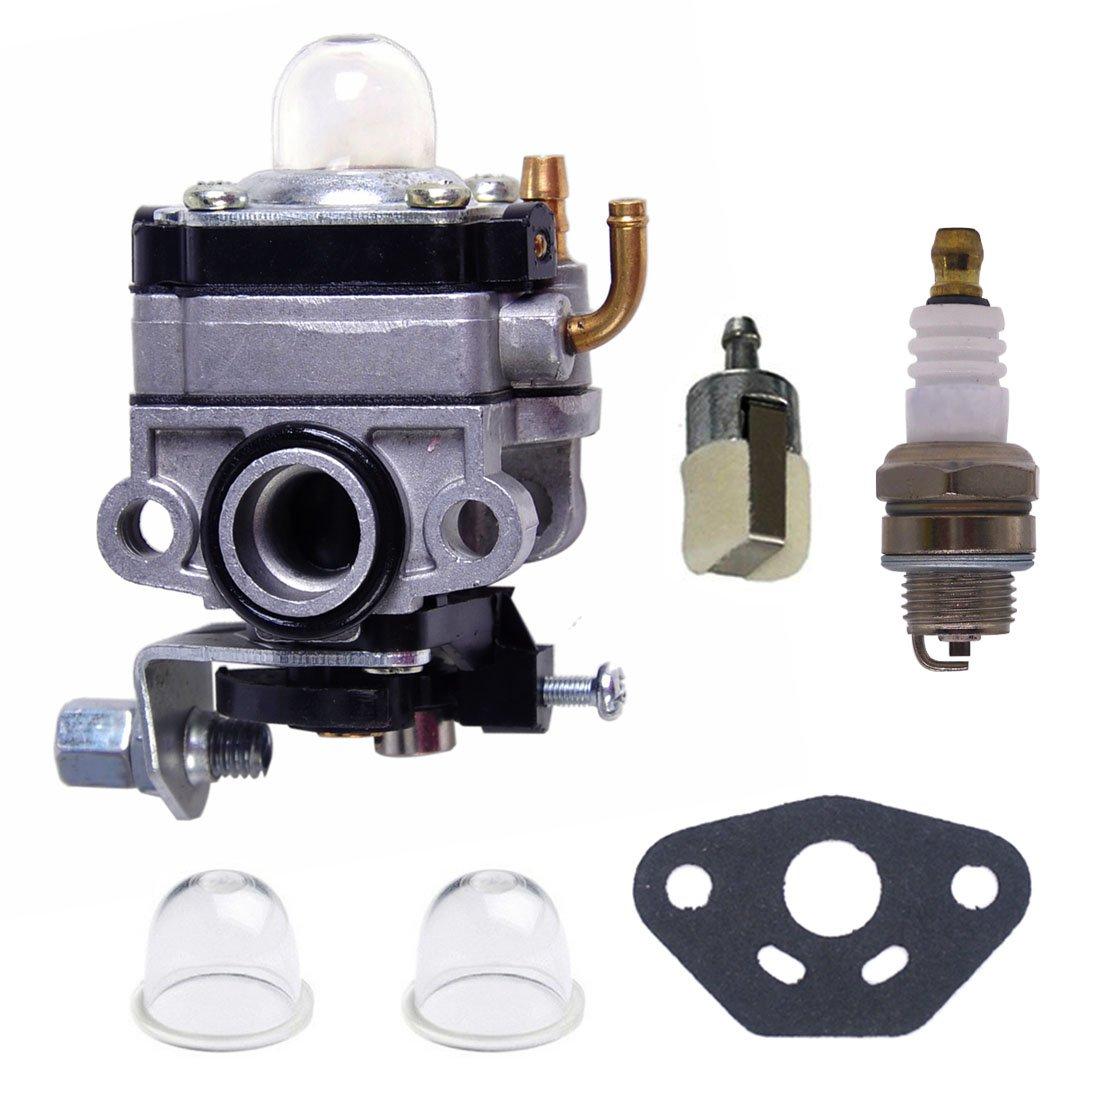 Amazon.com: Atoparts Carburetor Fuel Filter Primer Bulb Shindaiwa T282  T282X String Grass Trimmer Brushcutter: Garden & Outdoor